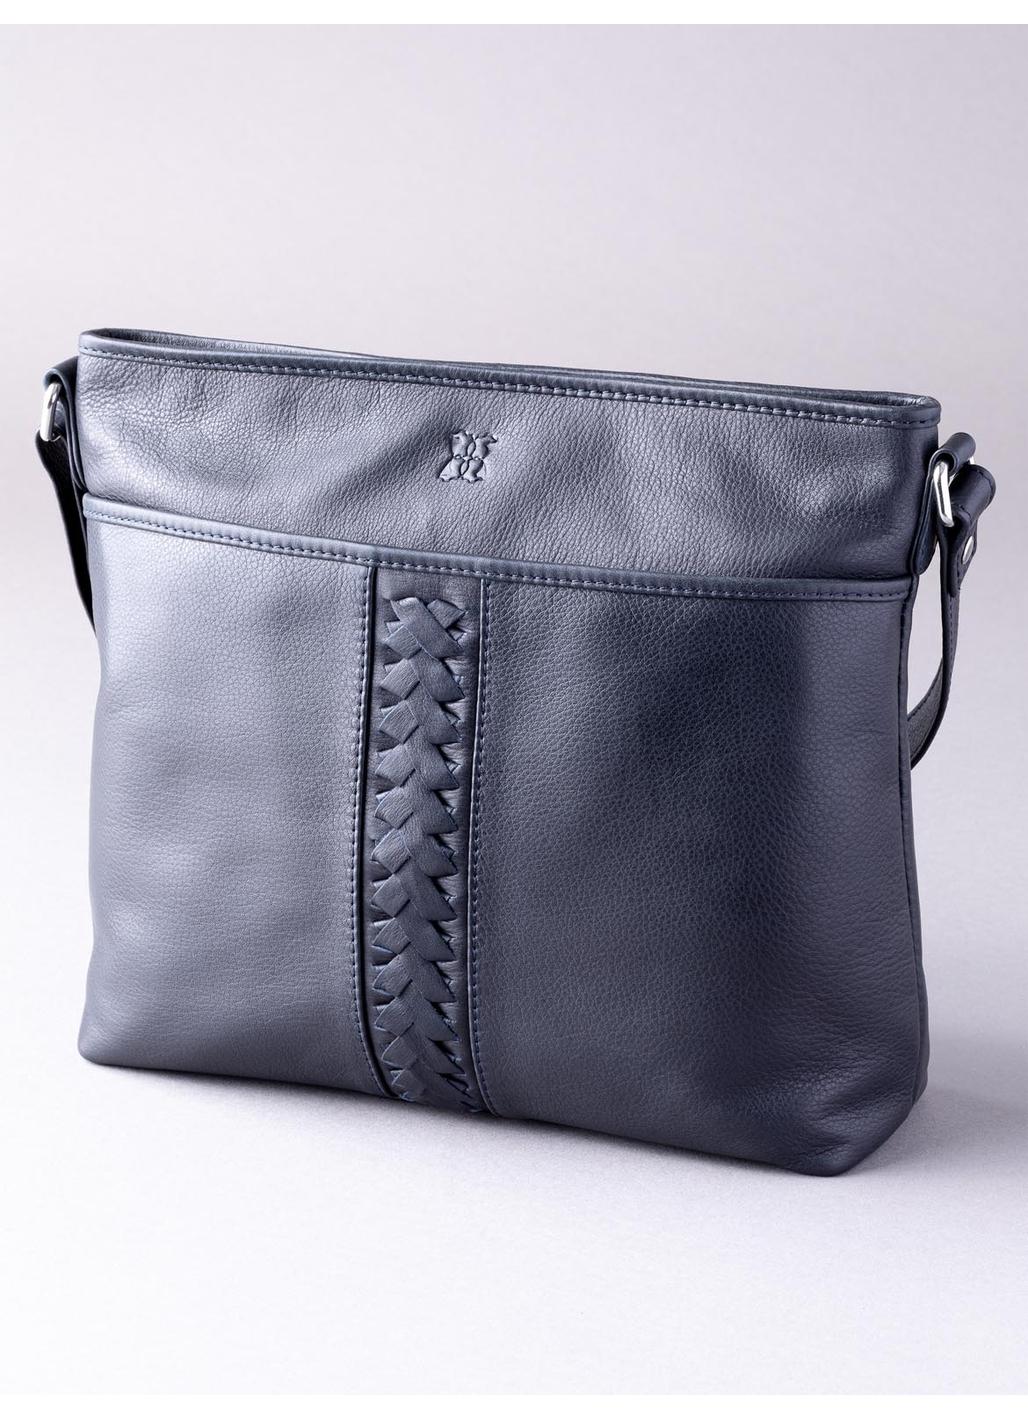 Farlam Leather Cross Body Bag in Navy